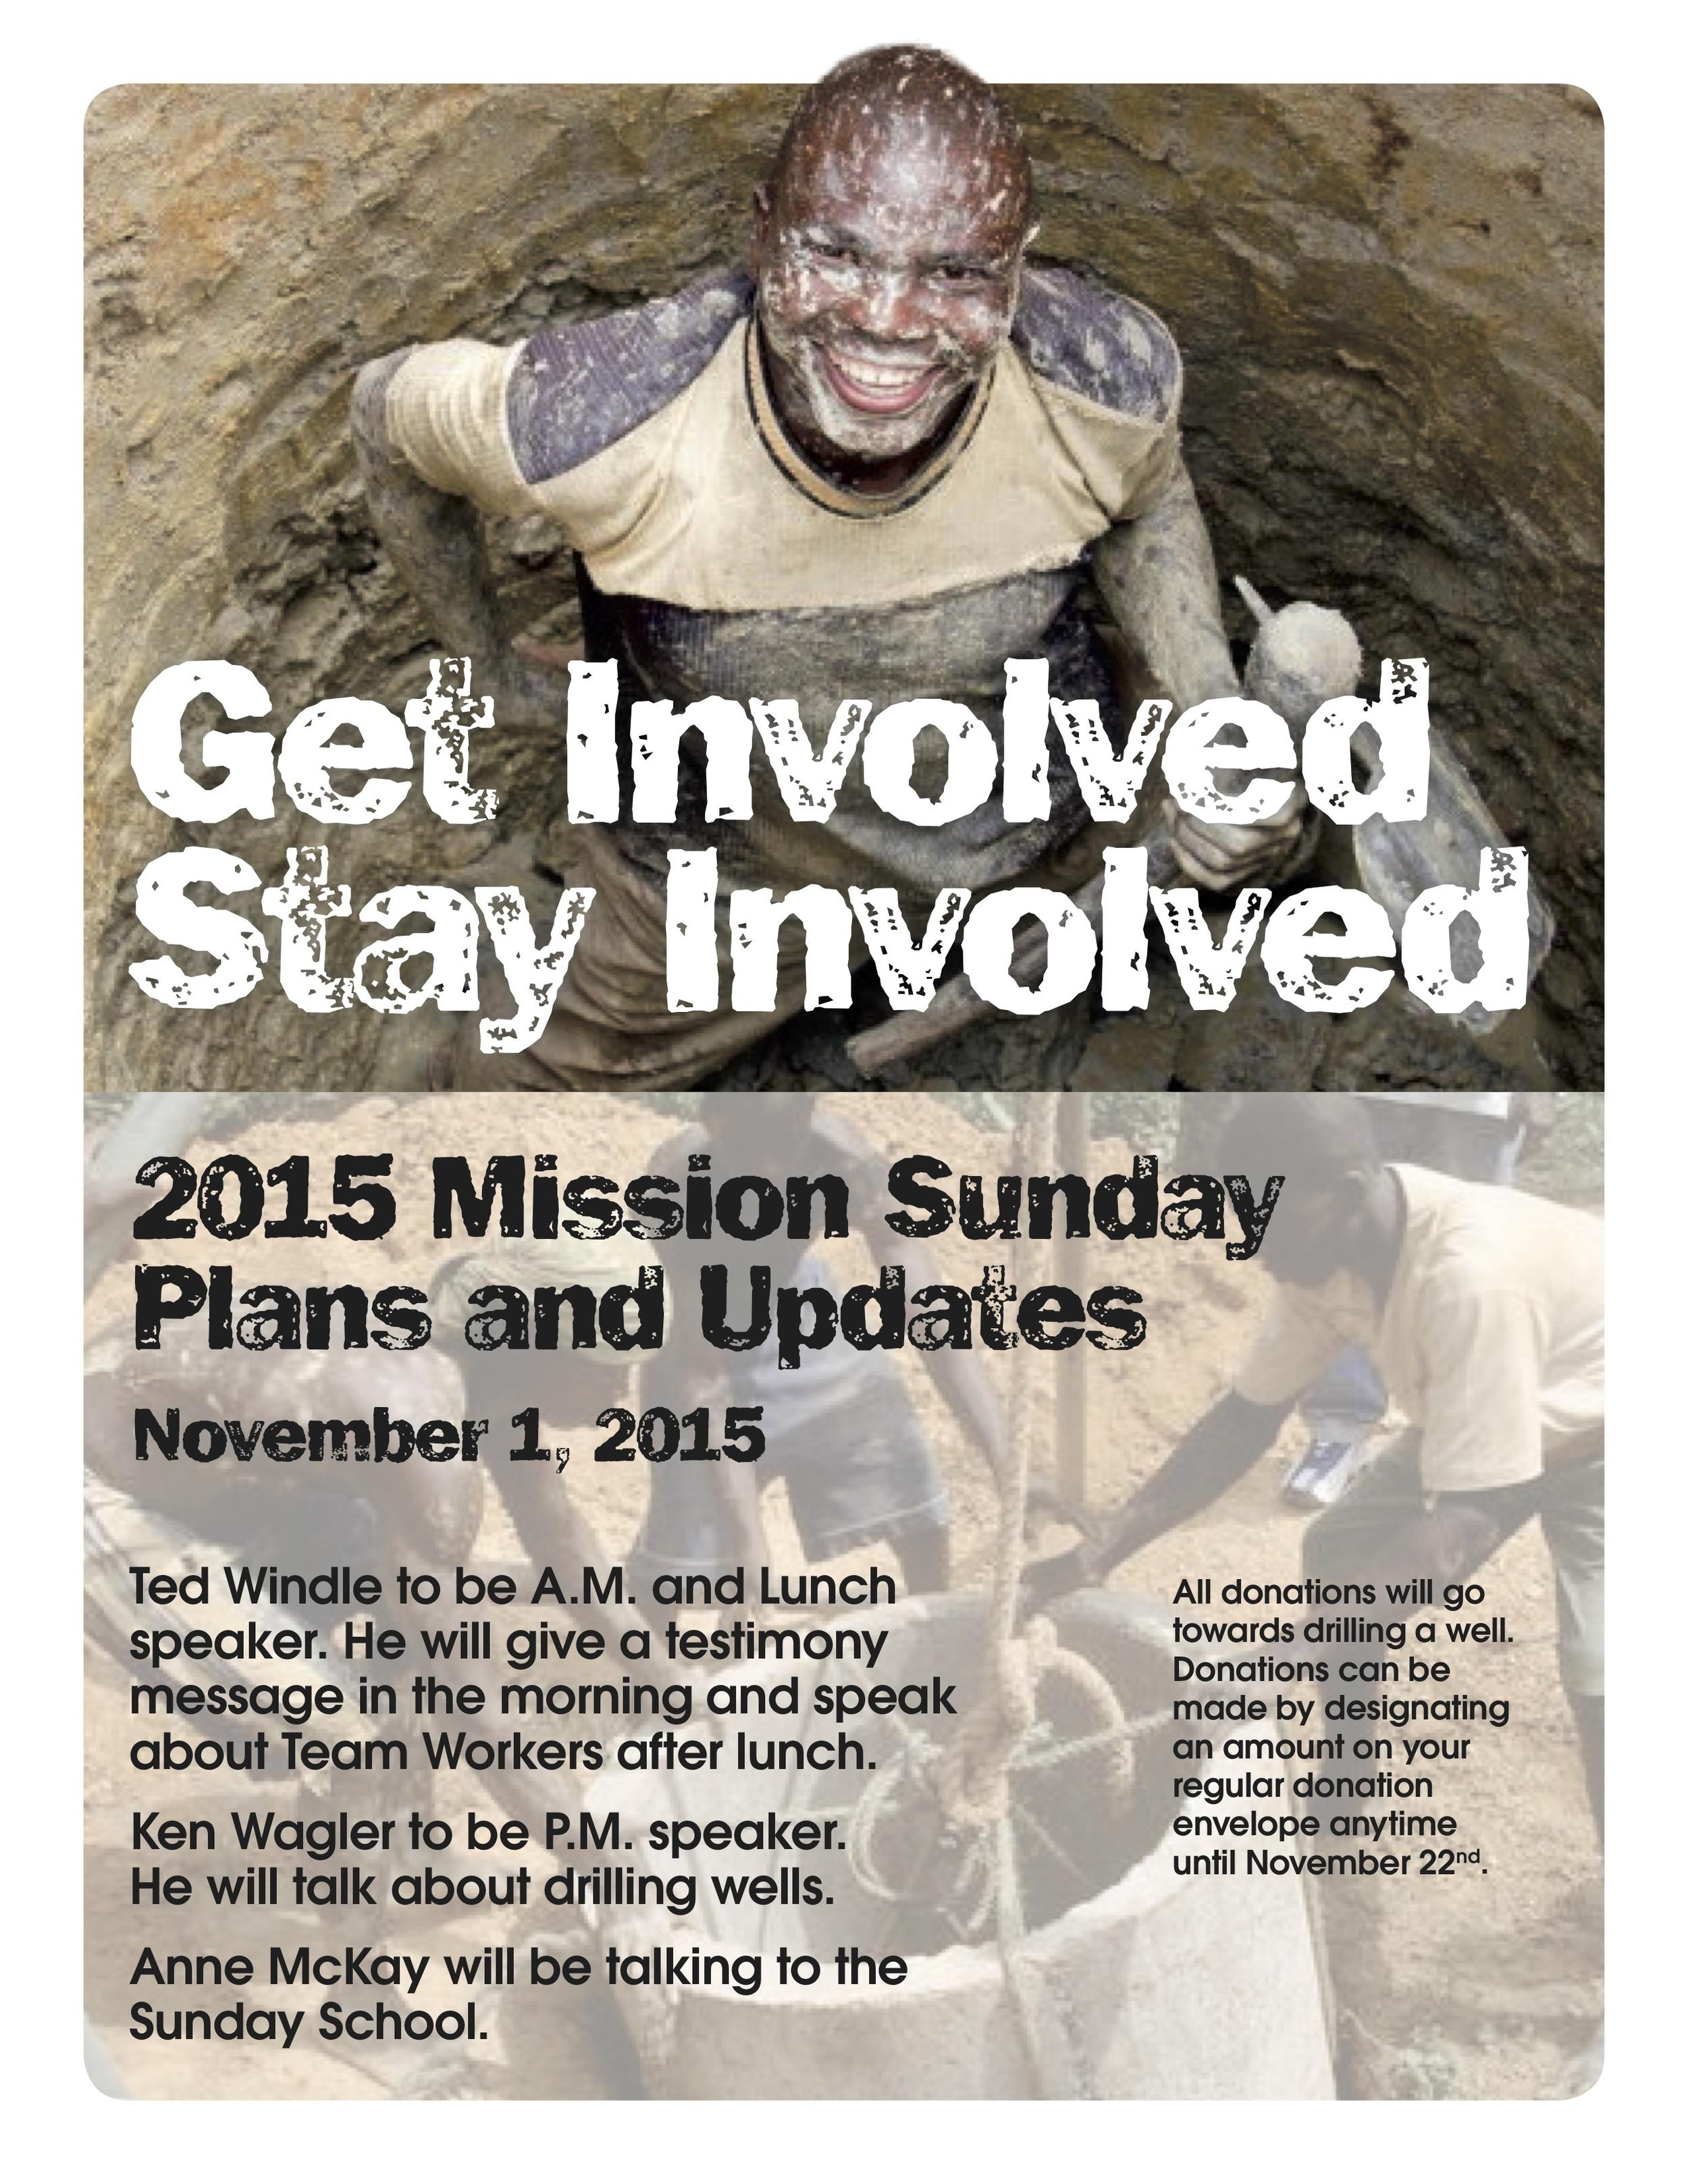 Missions Sunday 2015 Flyer.jpg